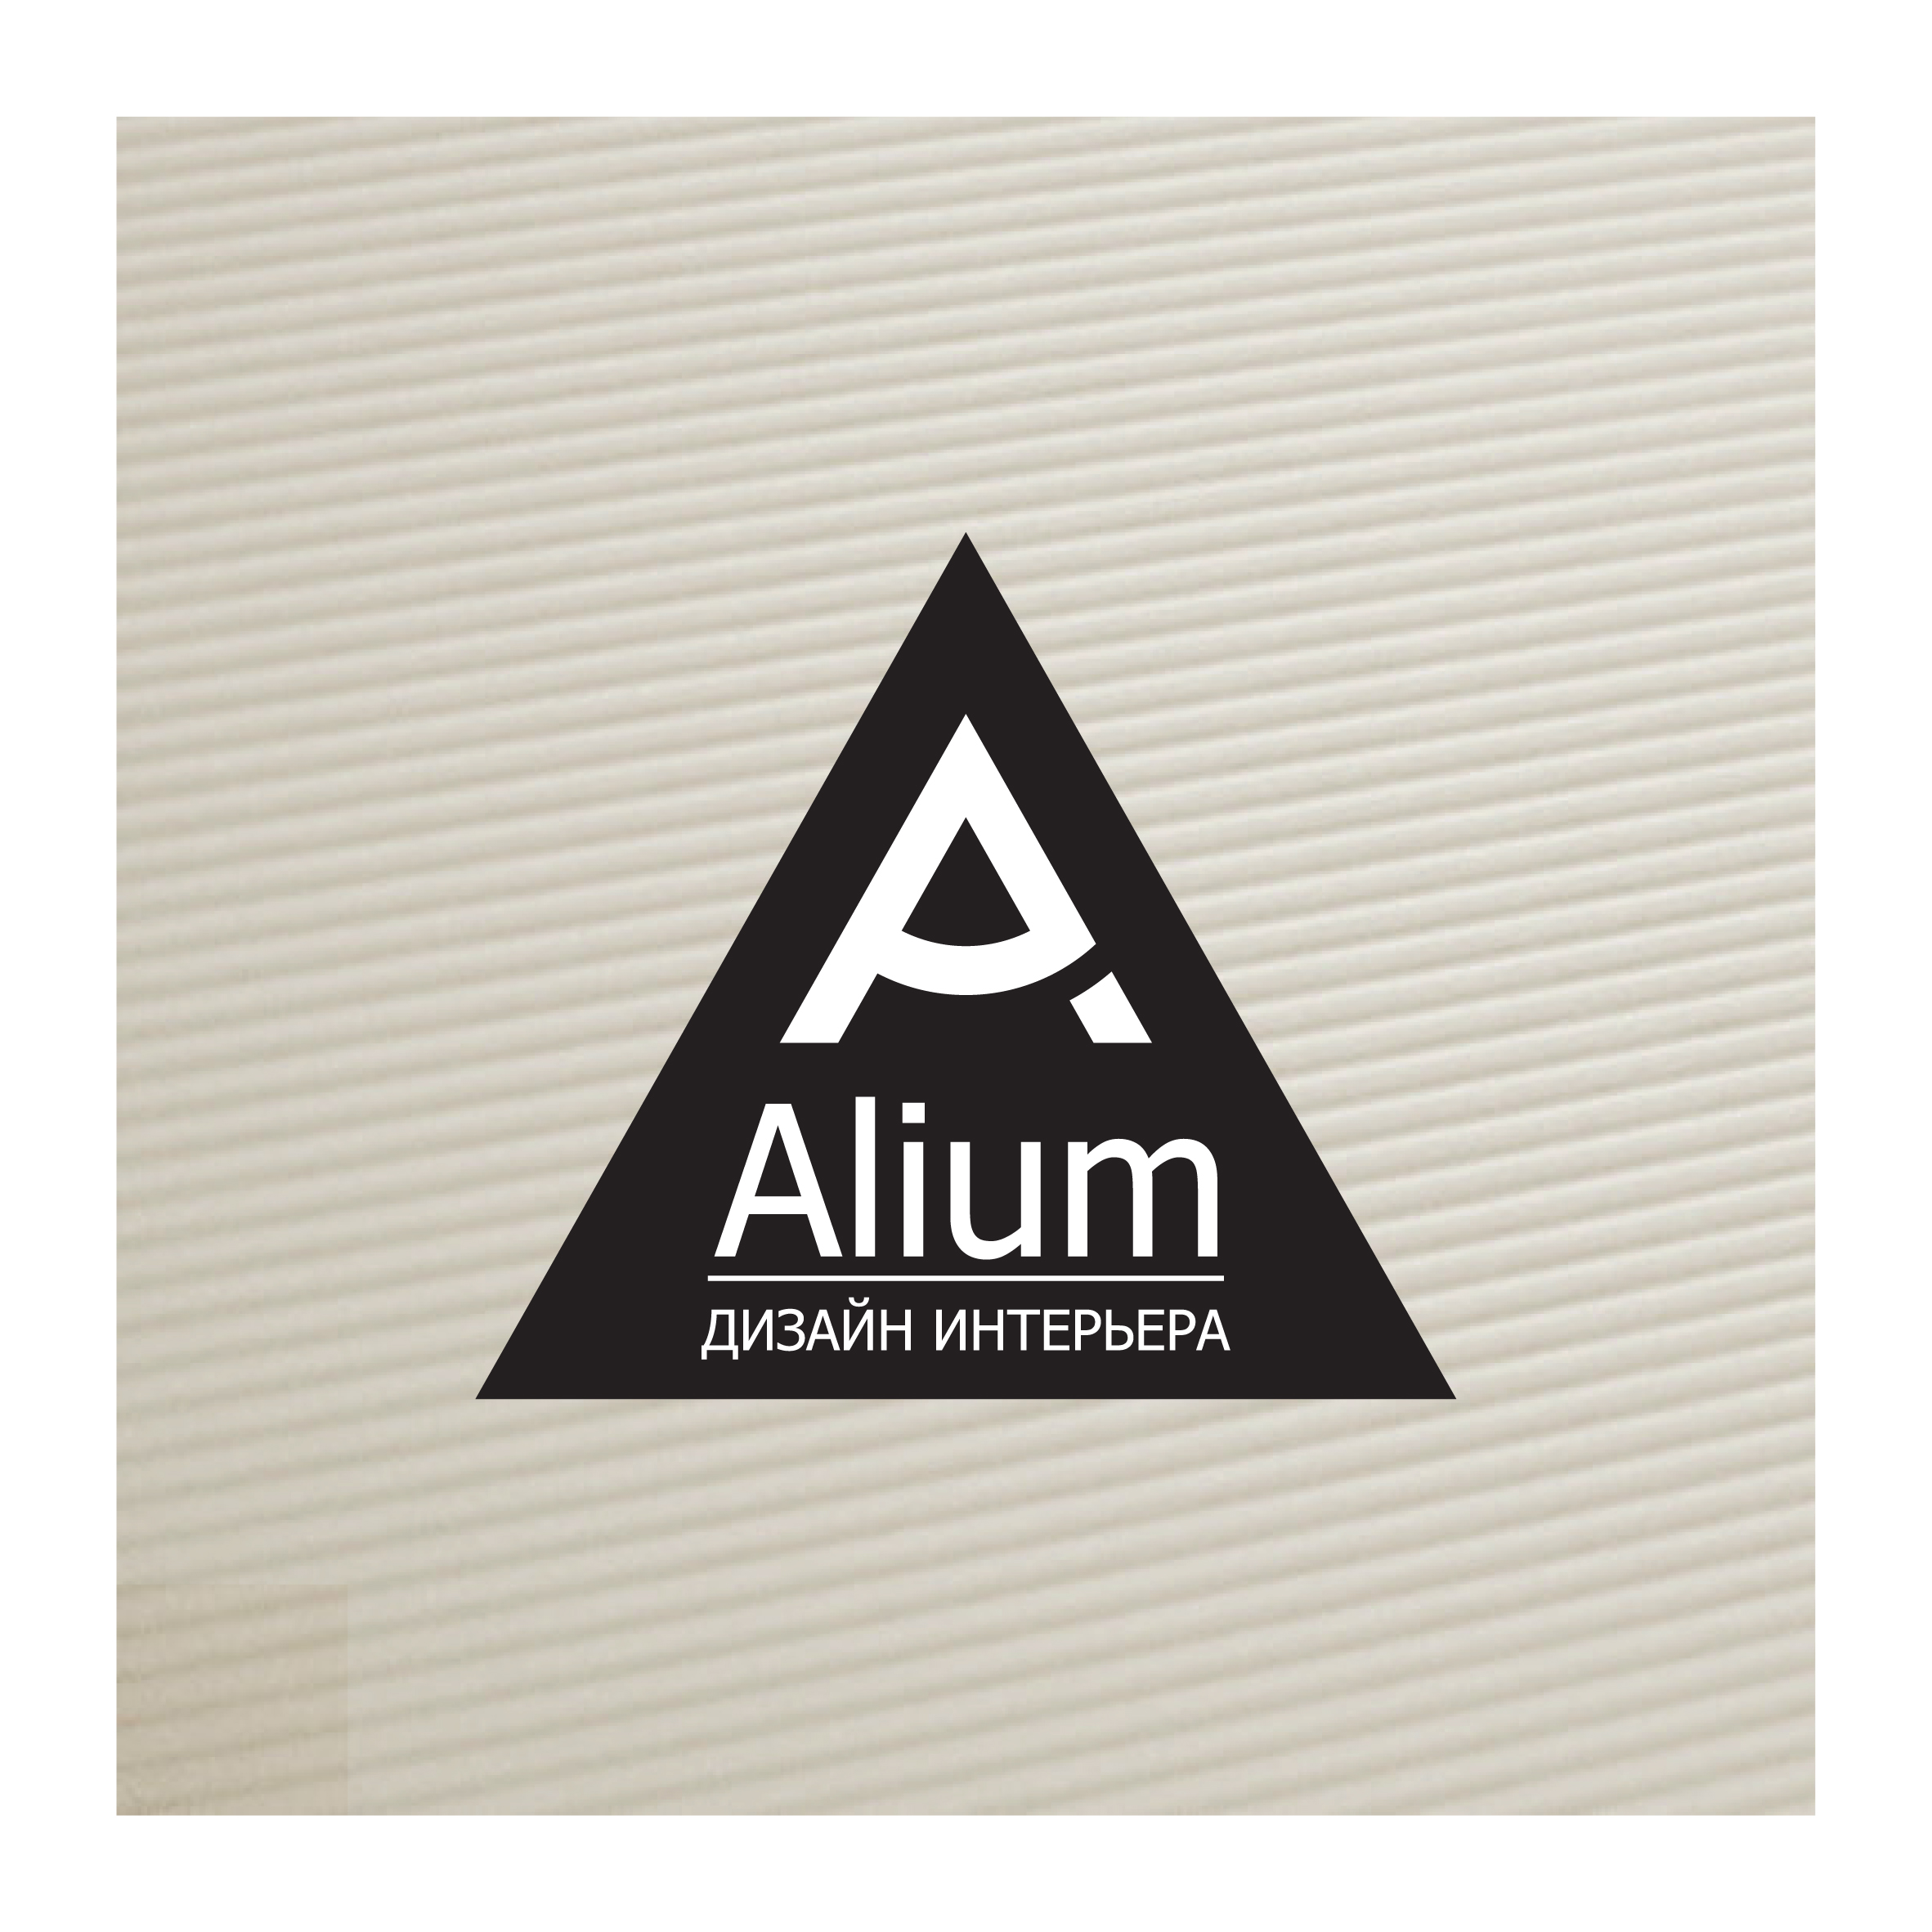 Логотип для дизайн студии фото f_56259ea08e4229cb.jpg